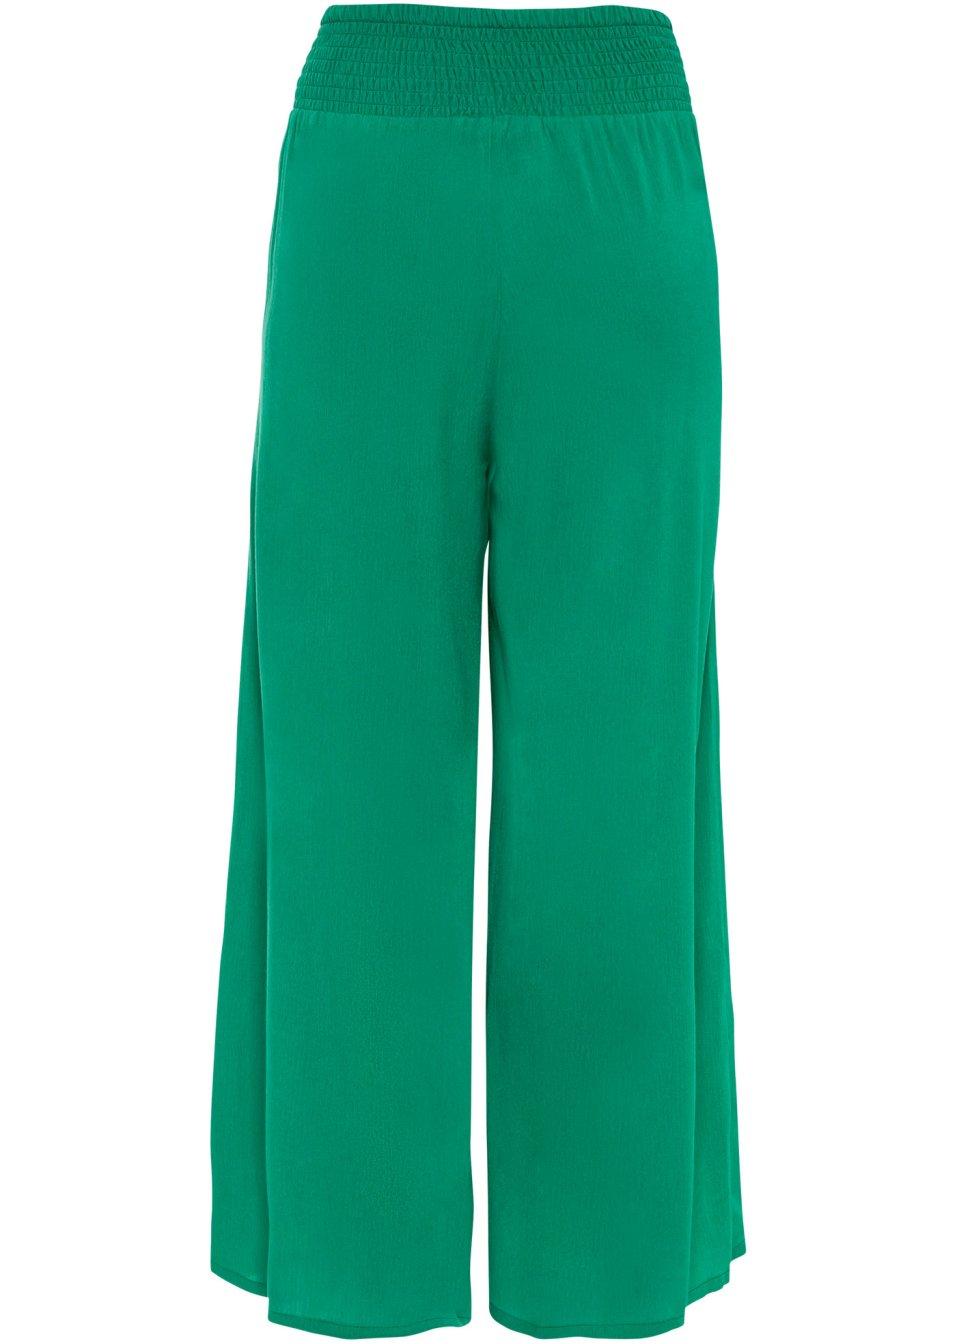 Mode Femme Vêtements DJLfdOFlkj Jupe-culotte avec poches latérales vert